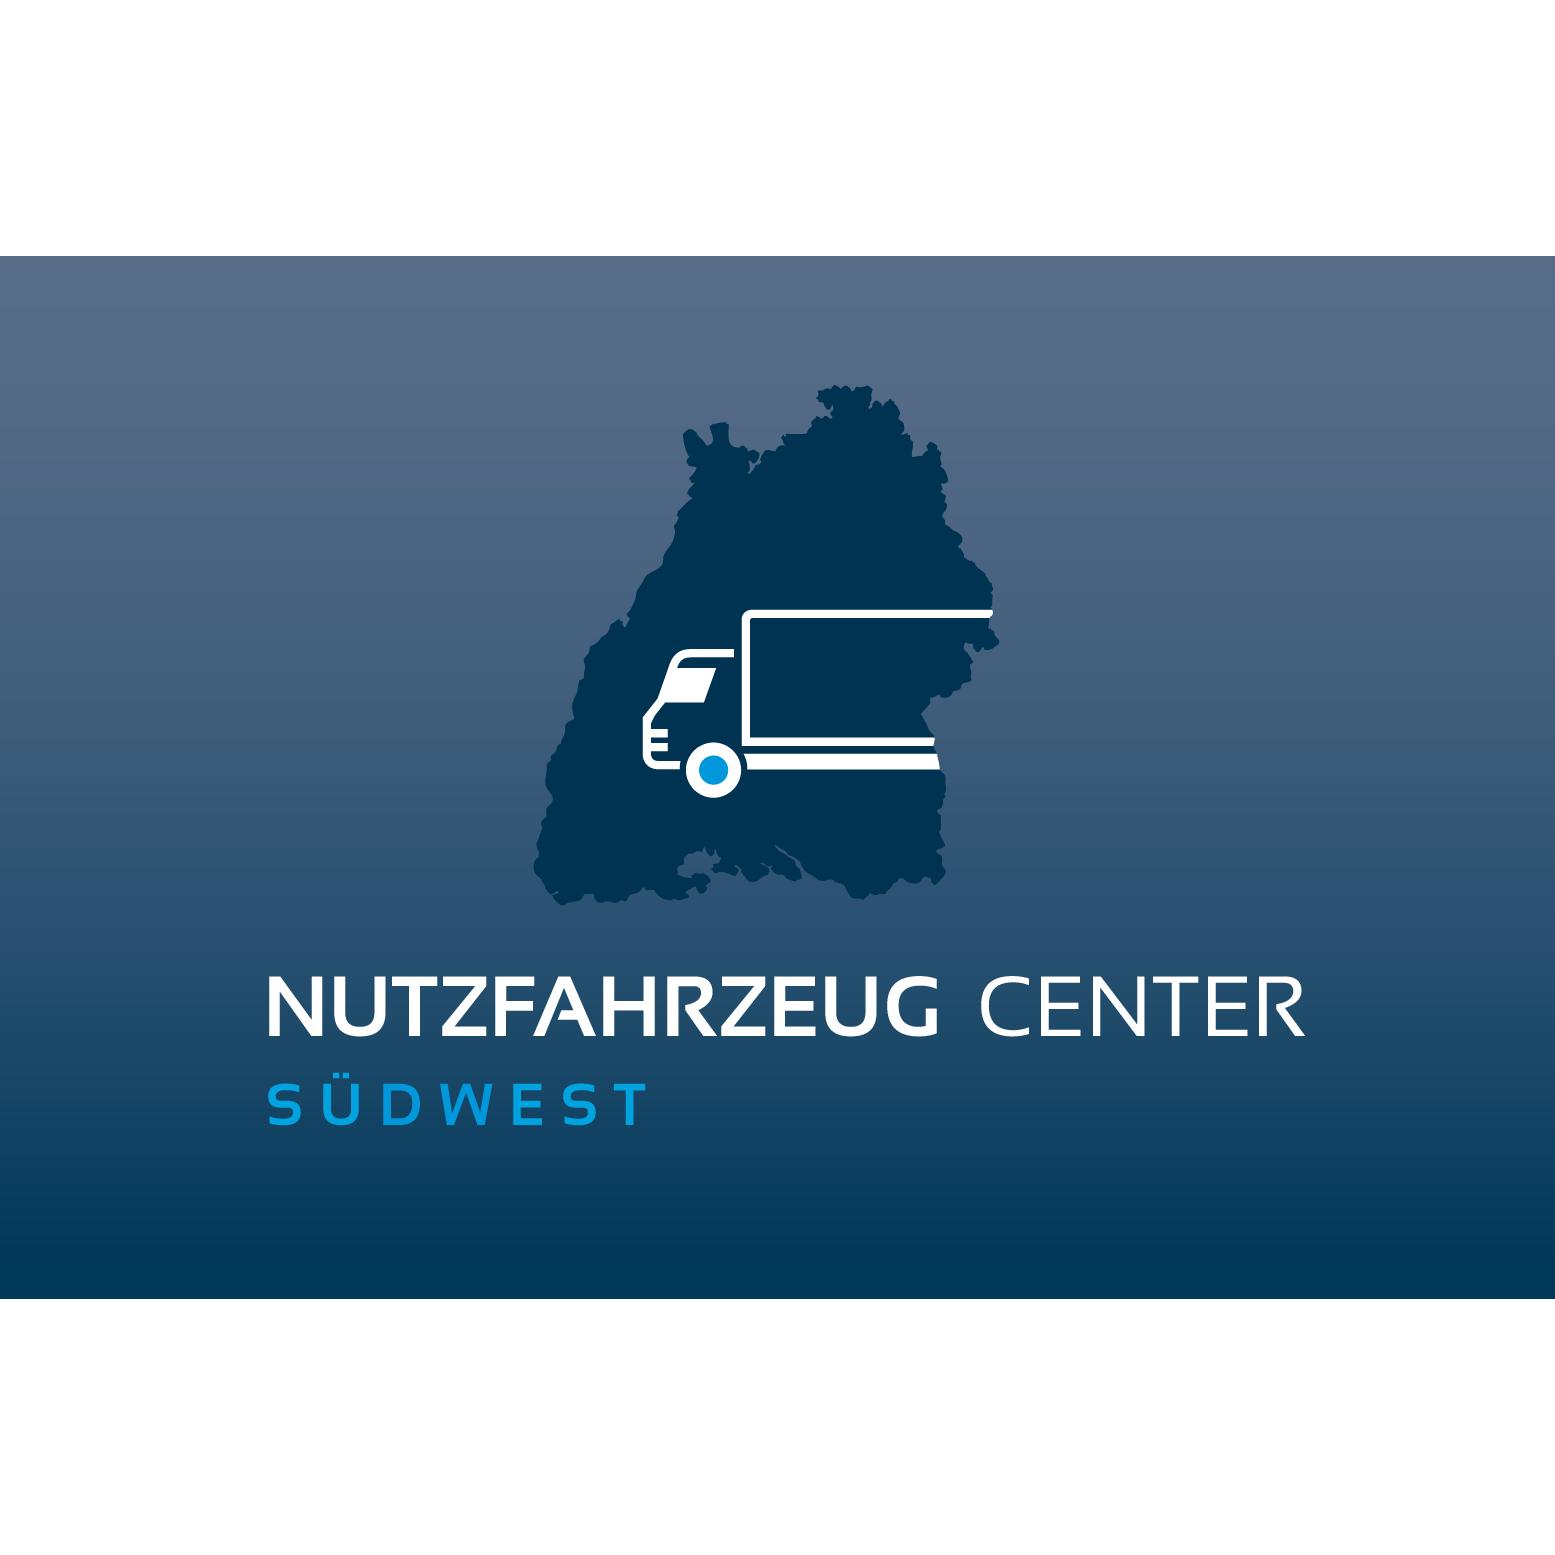 Logo von Nutzfahrzeugcenter Südwest e. K. - Inhaber Karim Benali